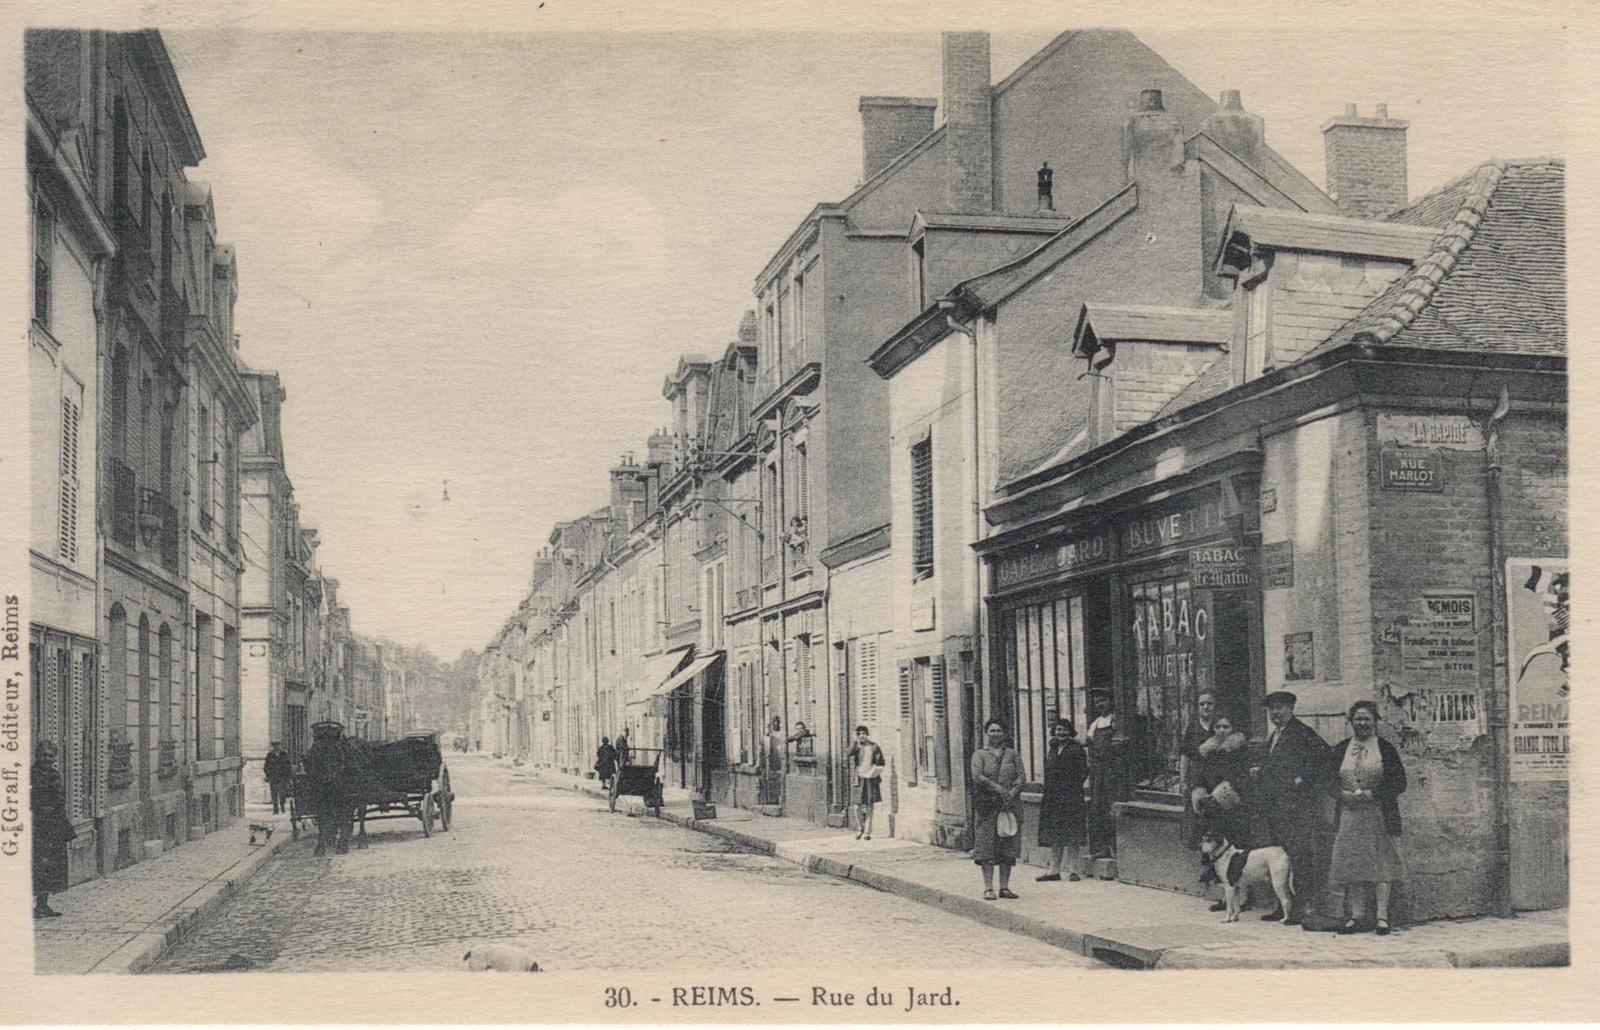 Rue du Jard, où logeait Paul Hess pendant la guerre